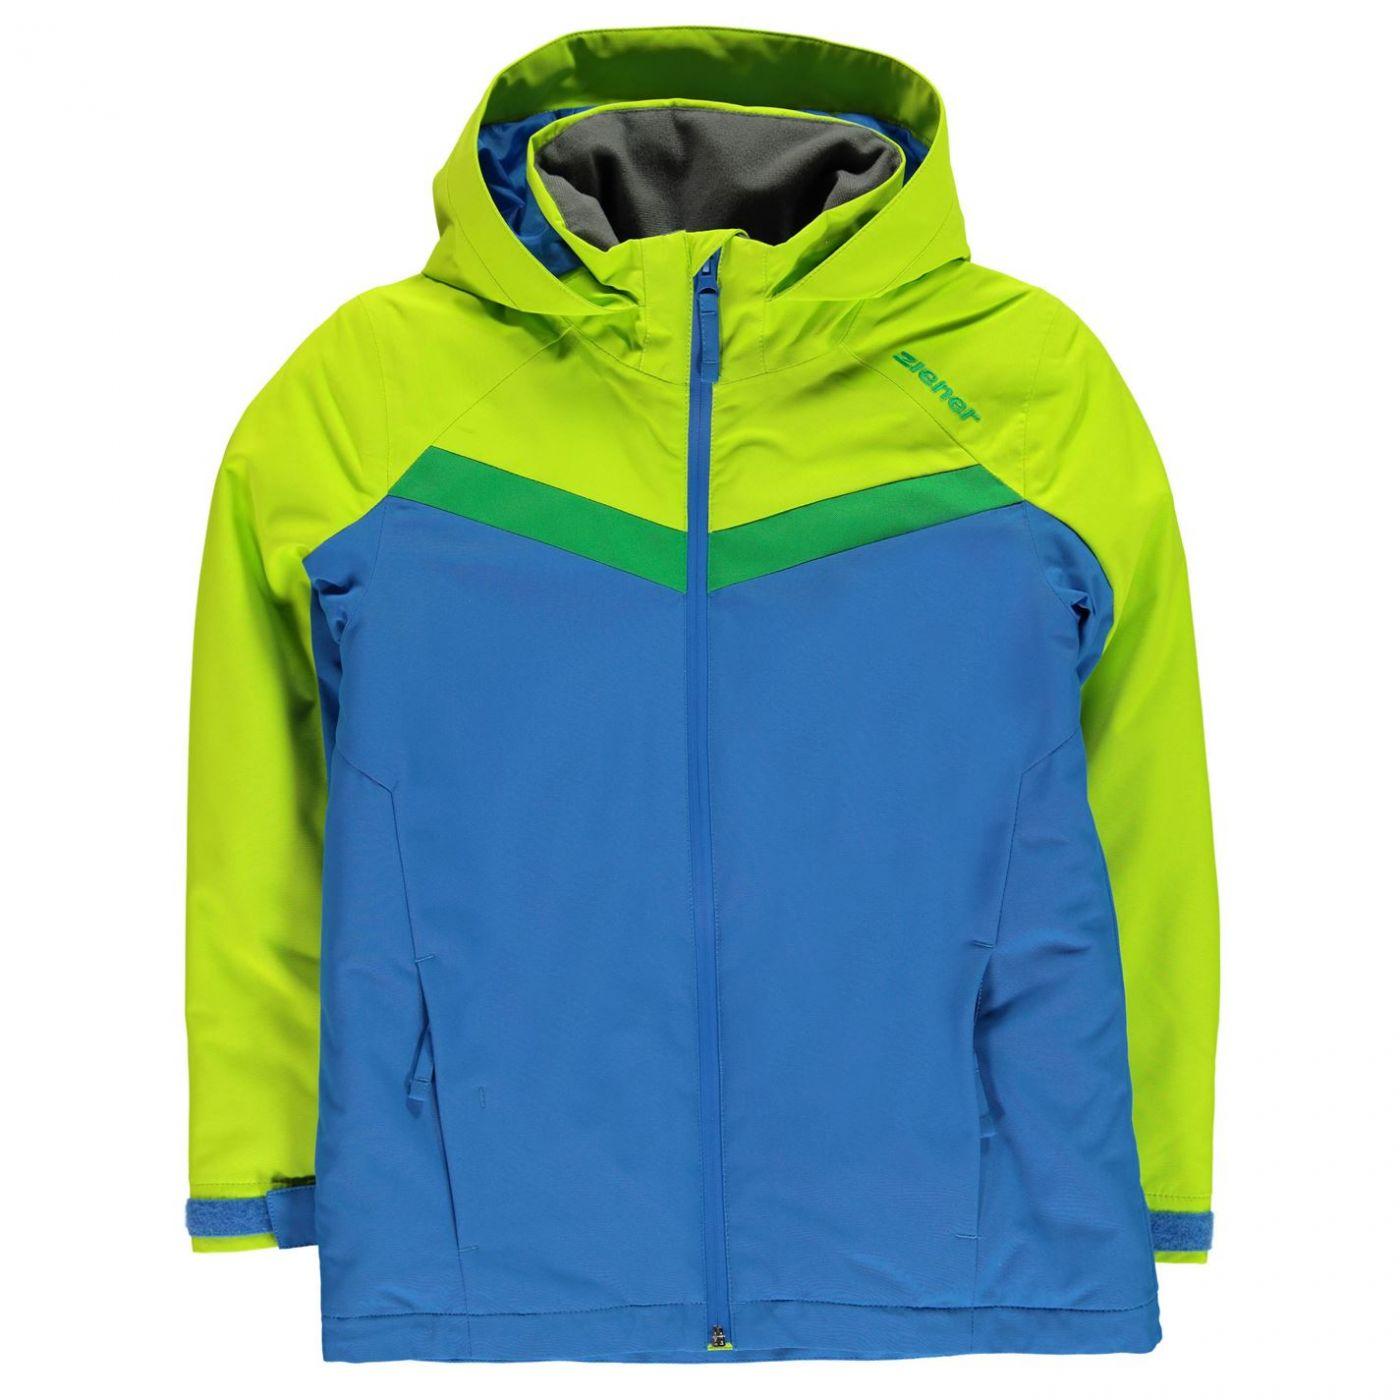 Ziener Alexes Jacket Junior Boys